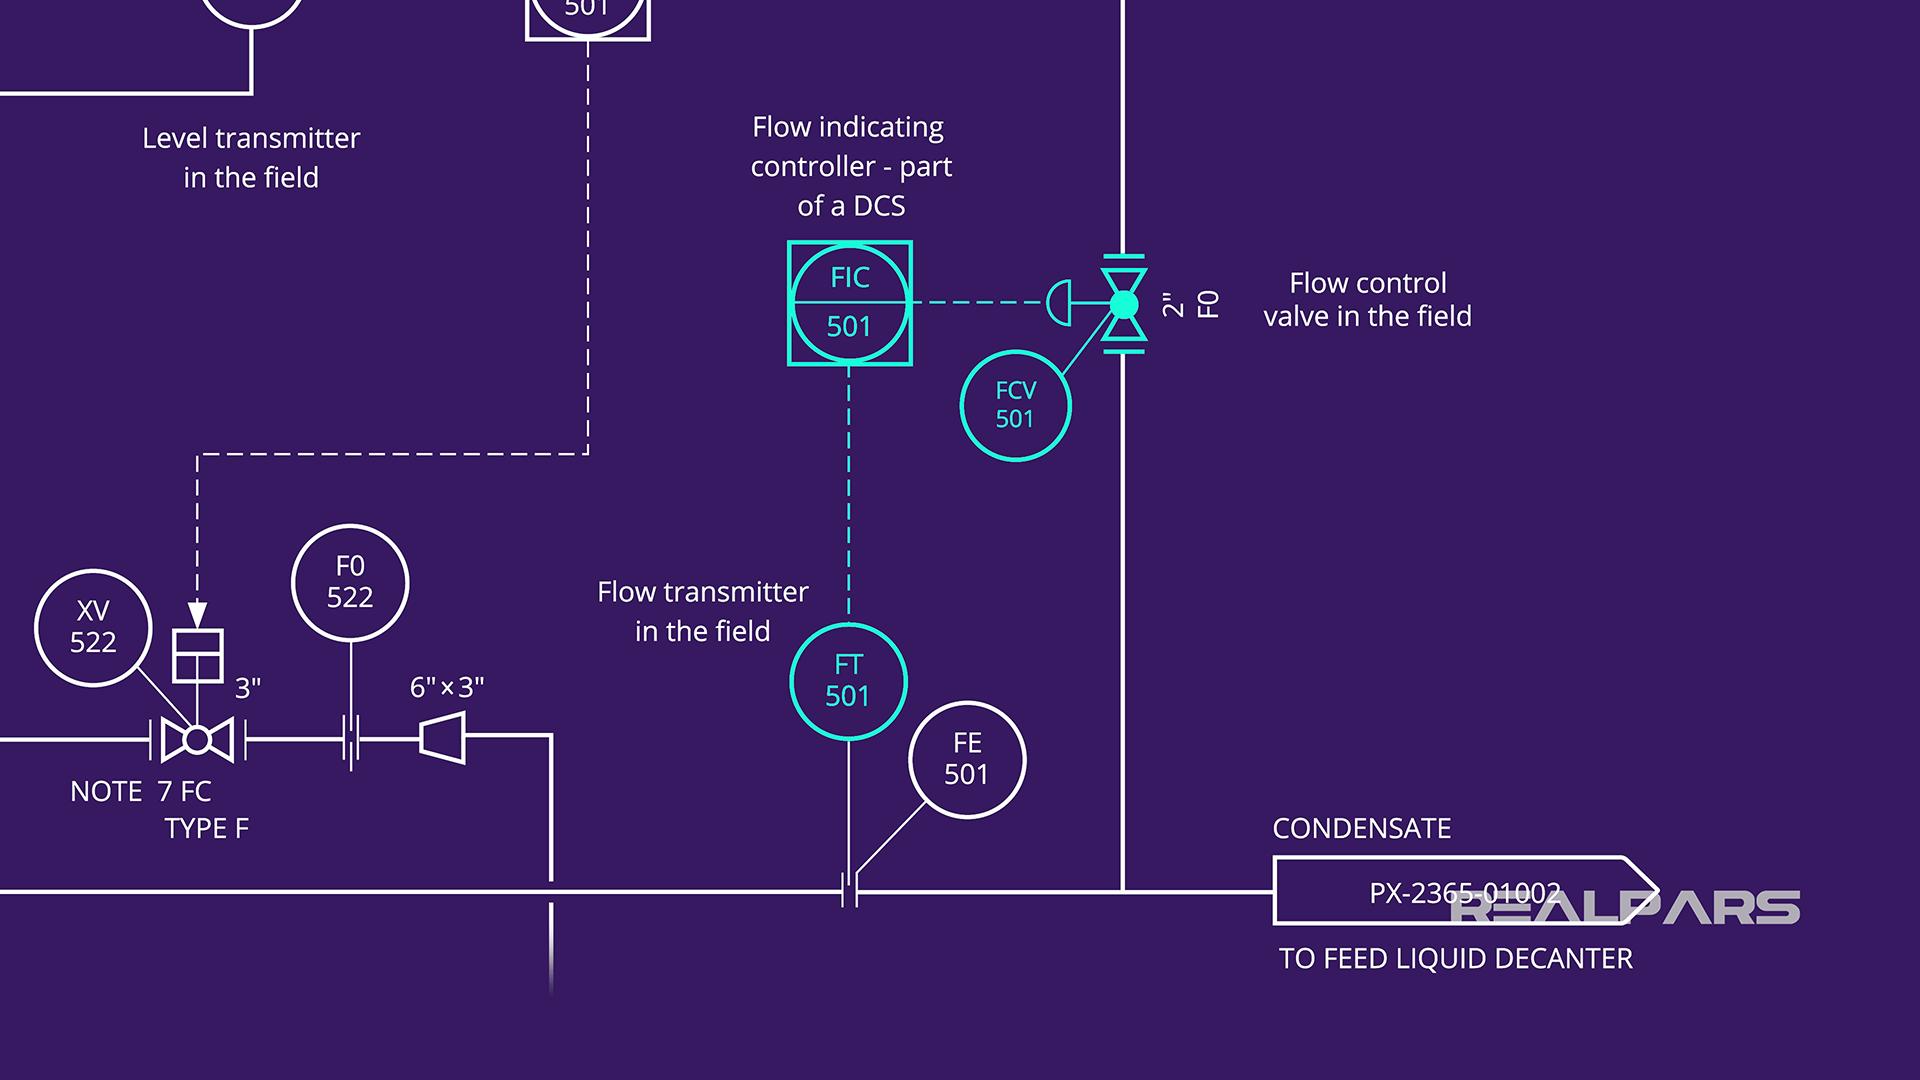 Operating A Control Valve